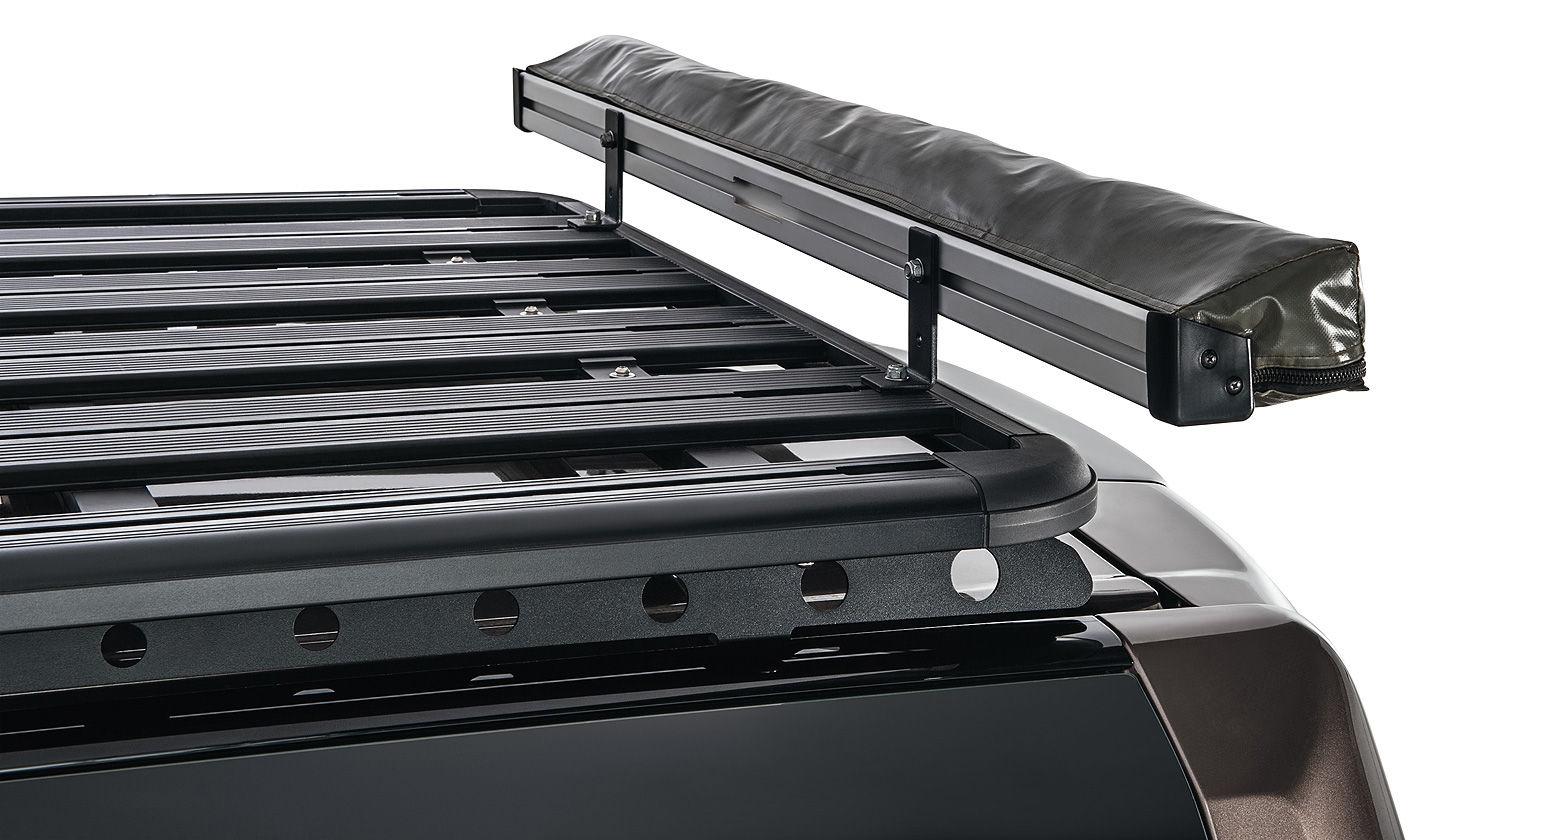 rhino rack markise dome 1 30m x 2 5m. Black Bedroom Furniture Sets. Home Design Ideas